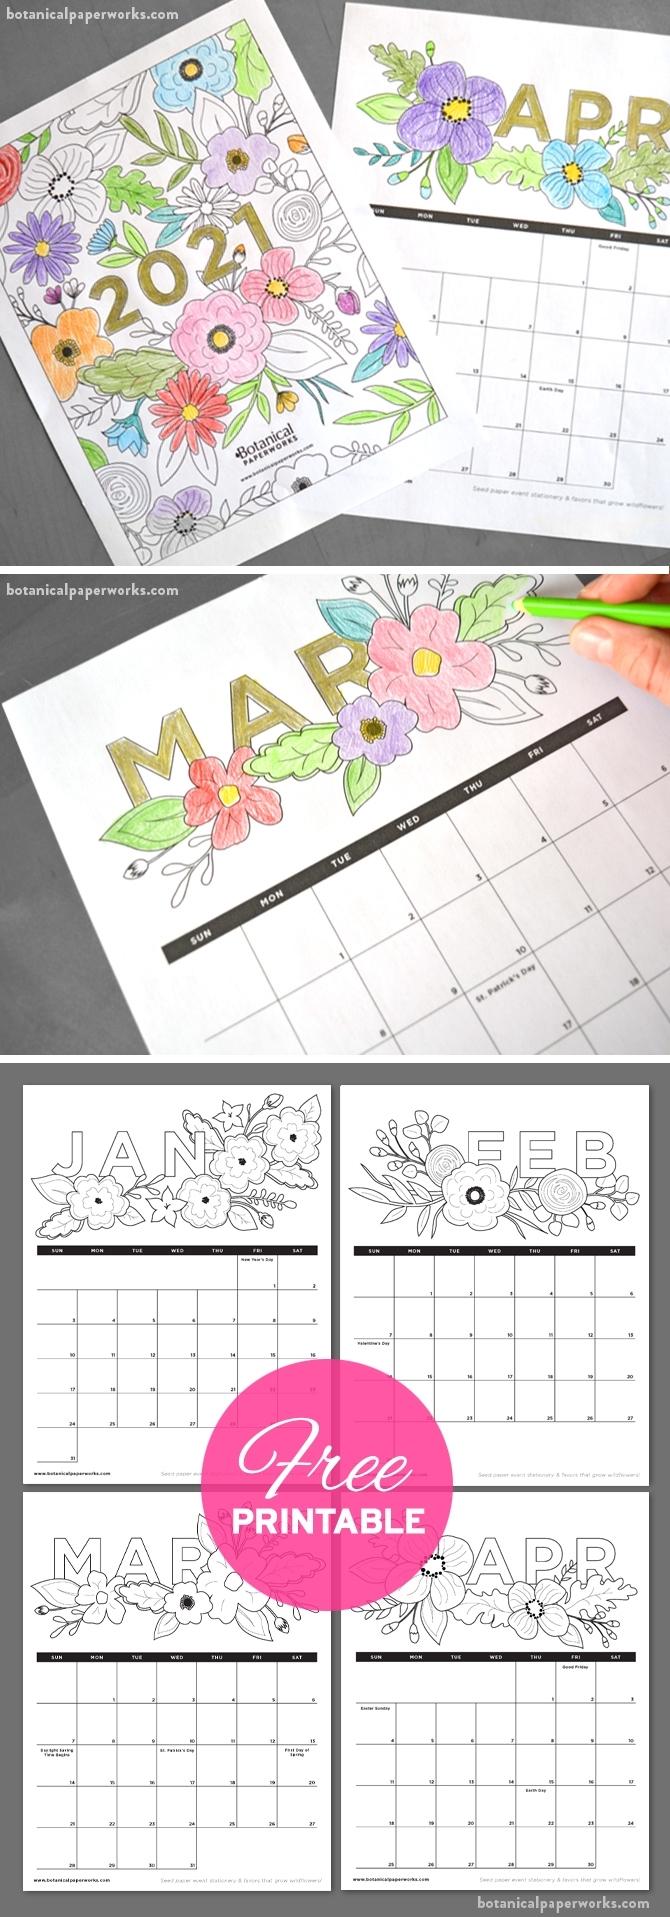 Take Free Printable Coloring Calendar 2021